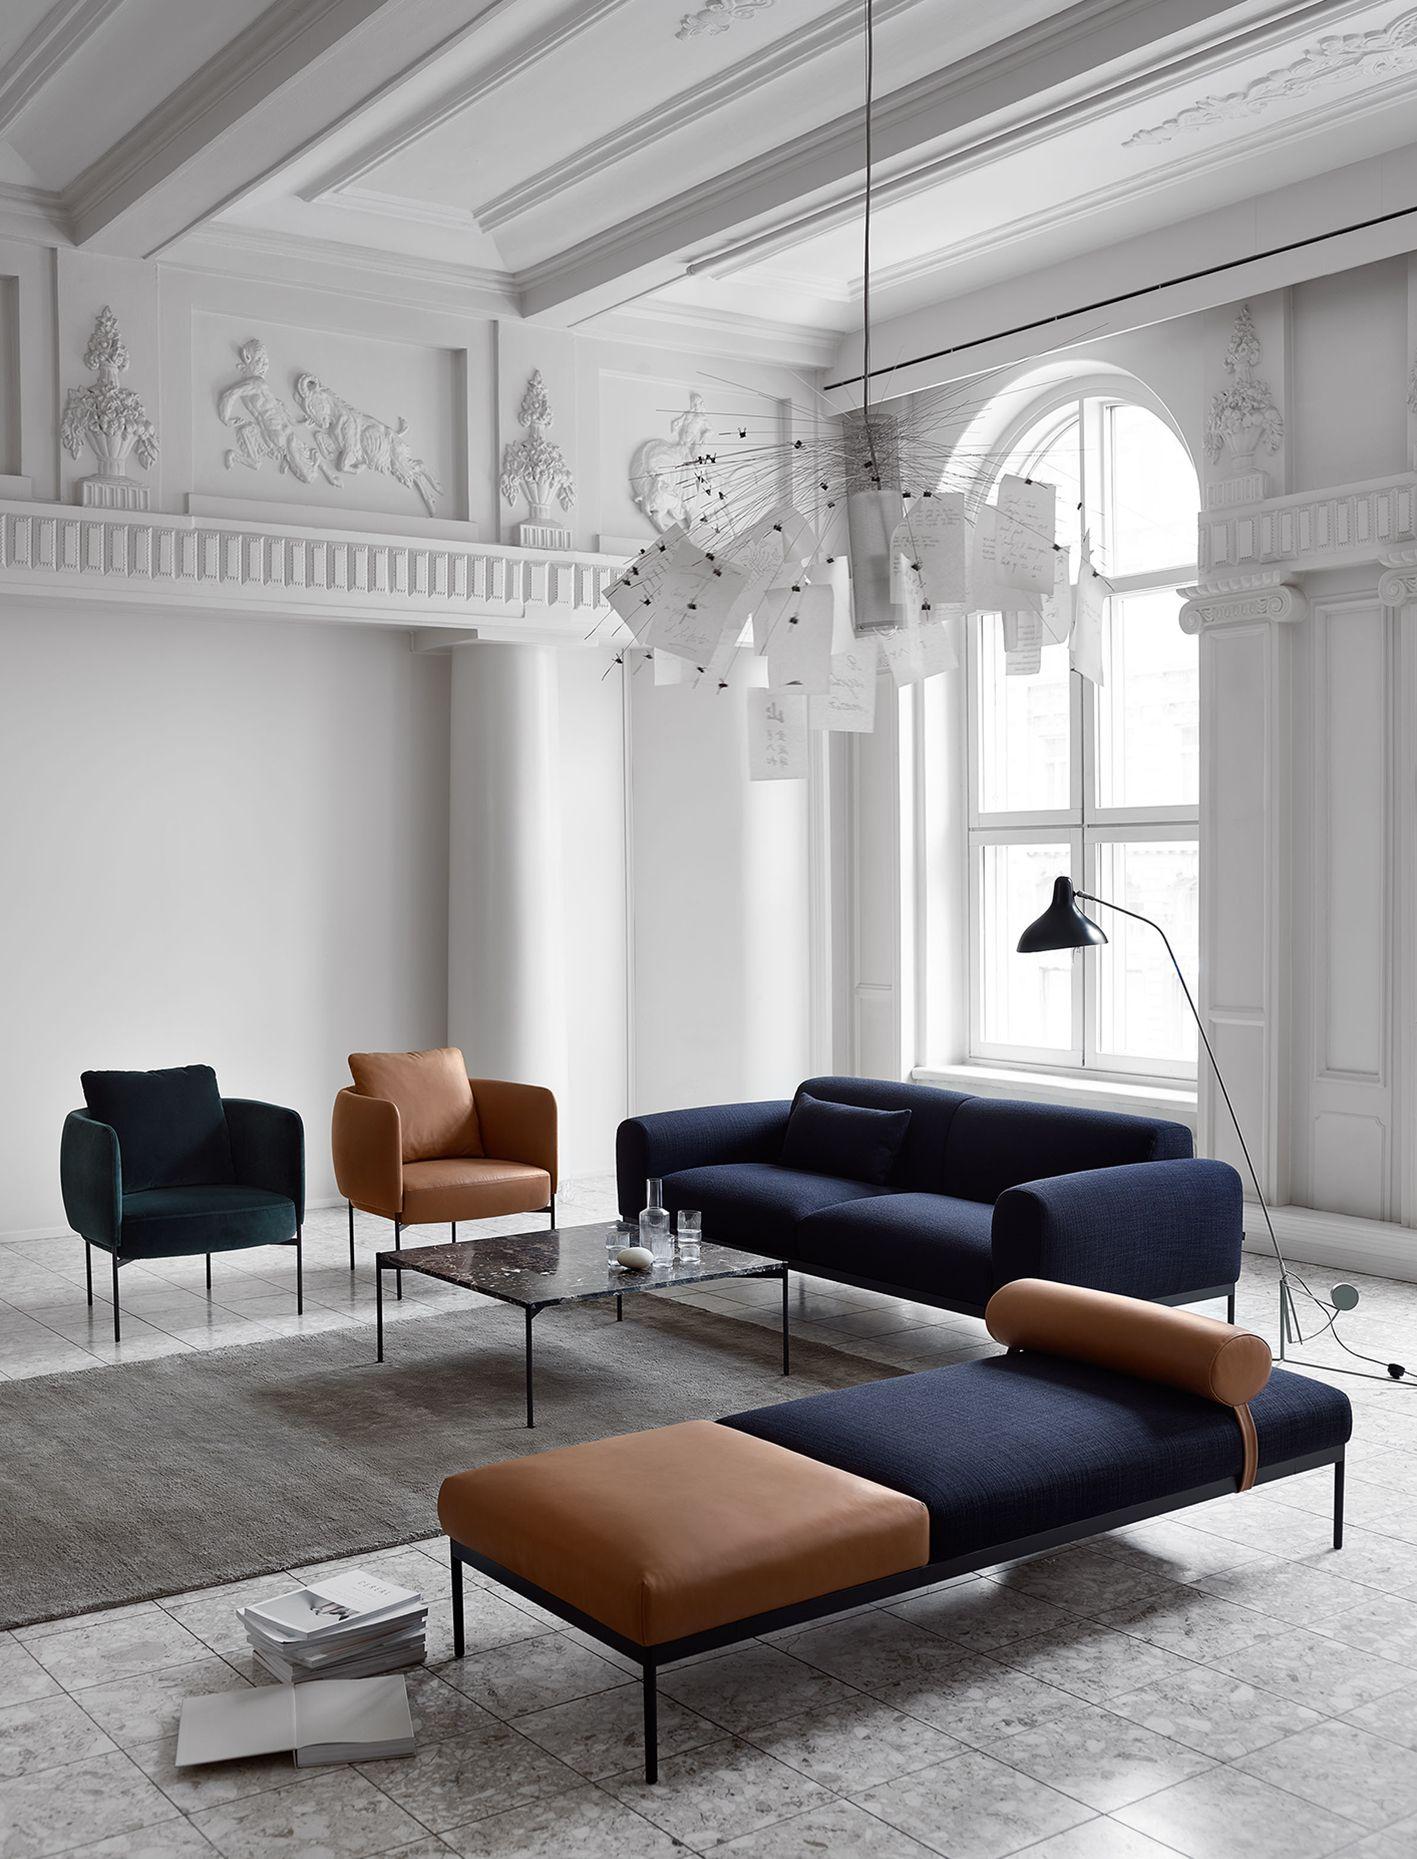 Uutta Adeaa (Varpunen) | Favorite color, Interiors and Living rooms